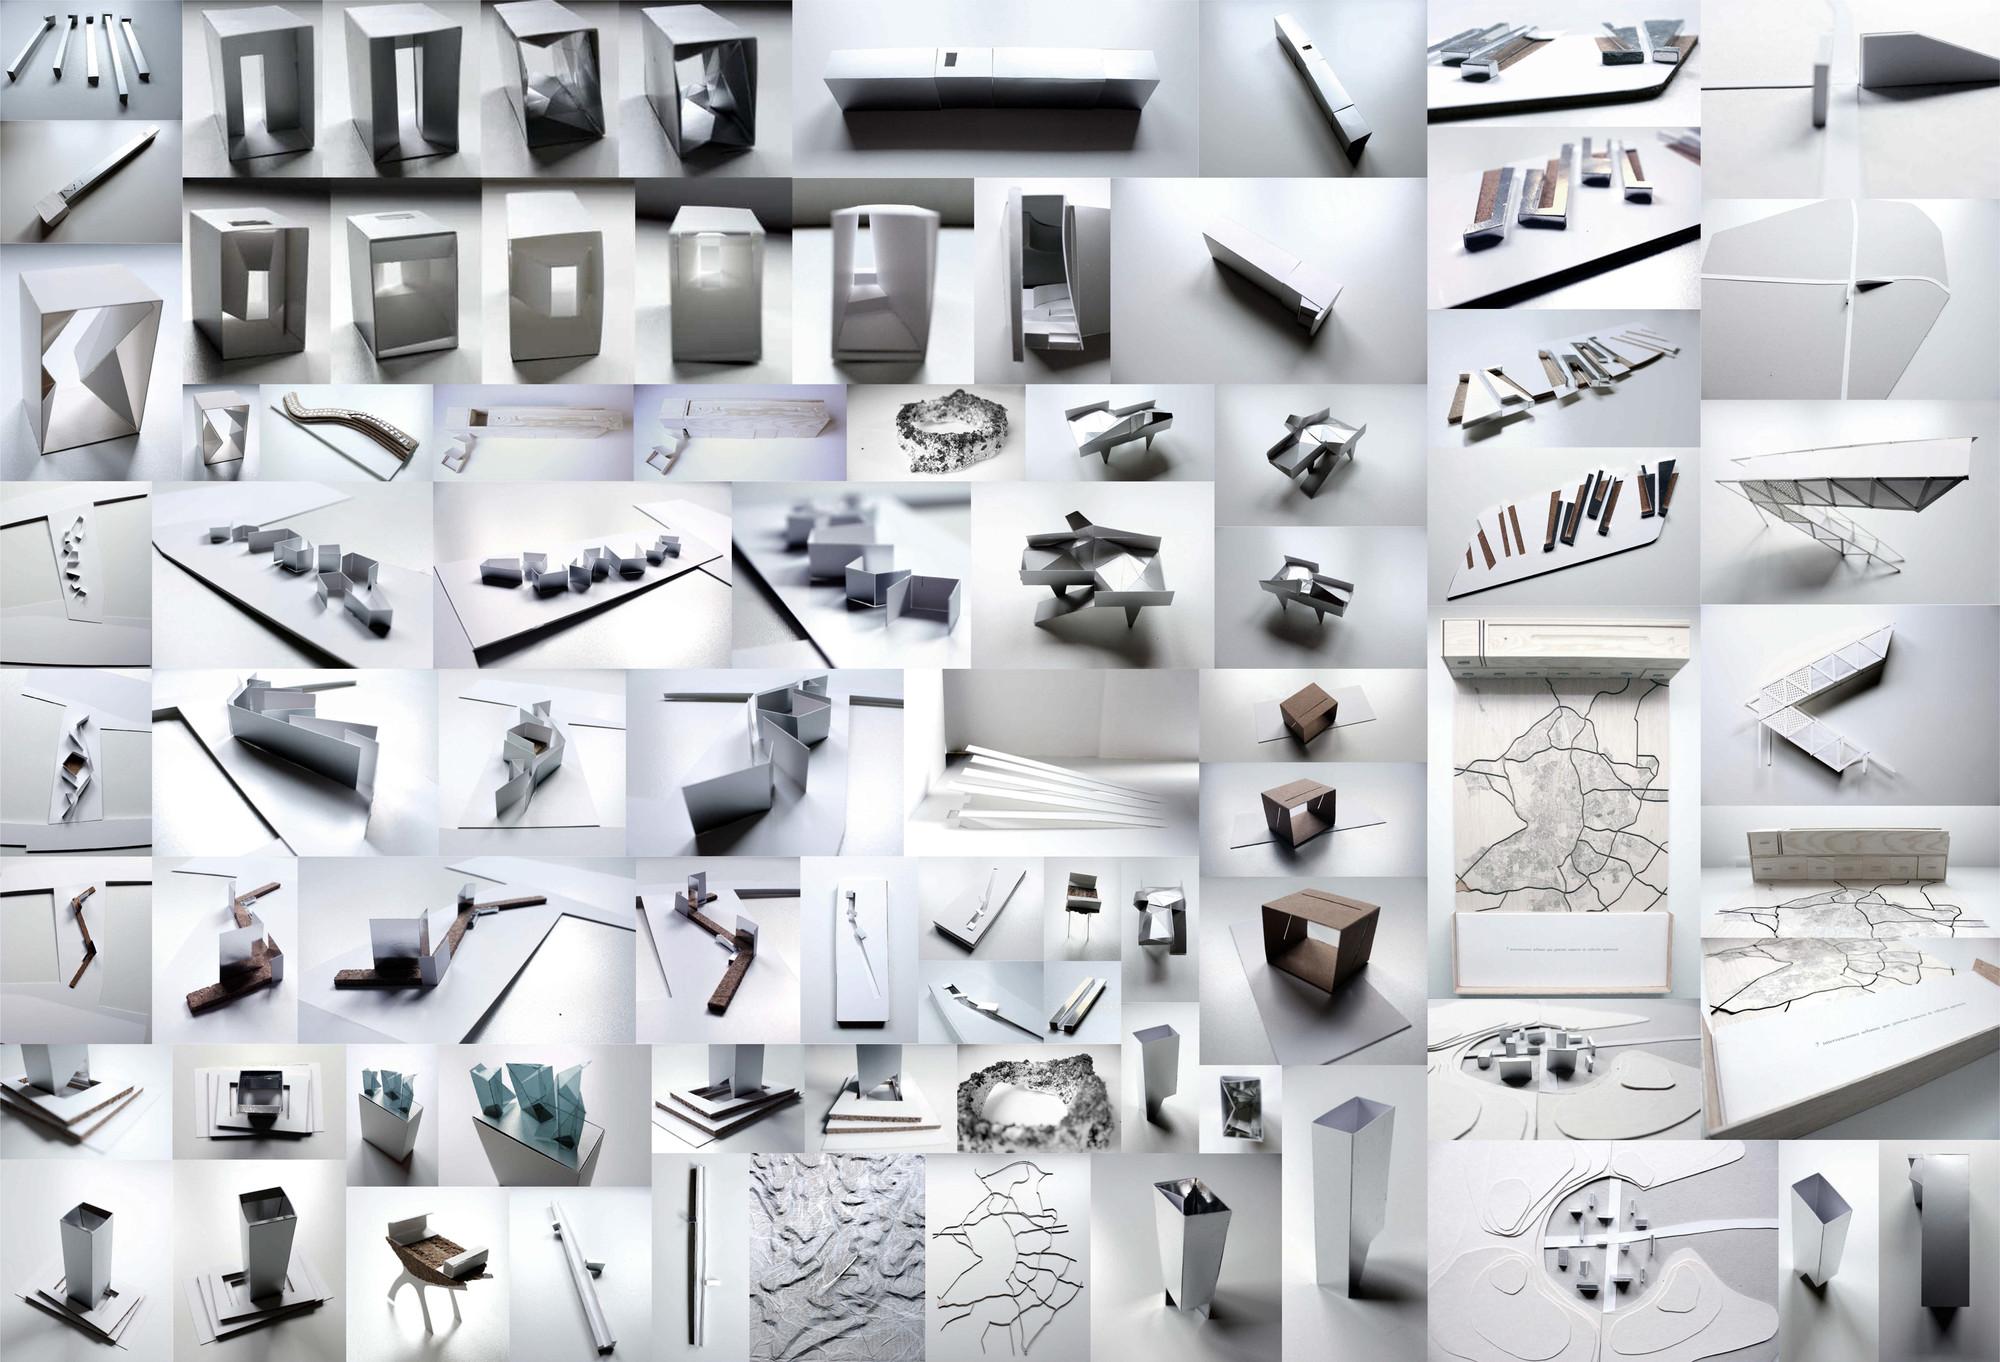 Laboratorio de maquetas. Image Cortesia de Lucía Barrantes Egaña